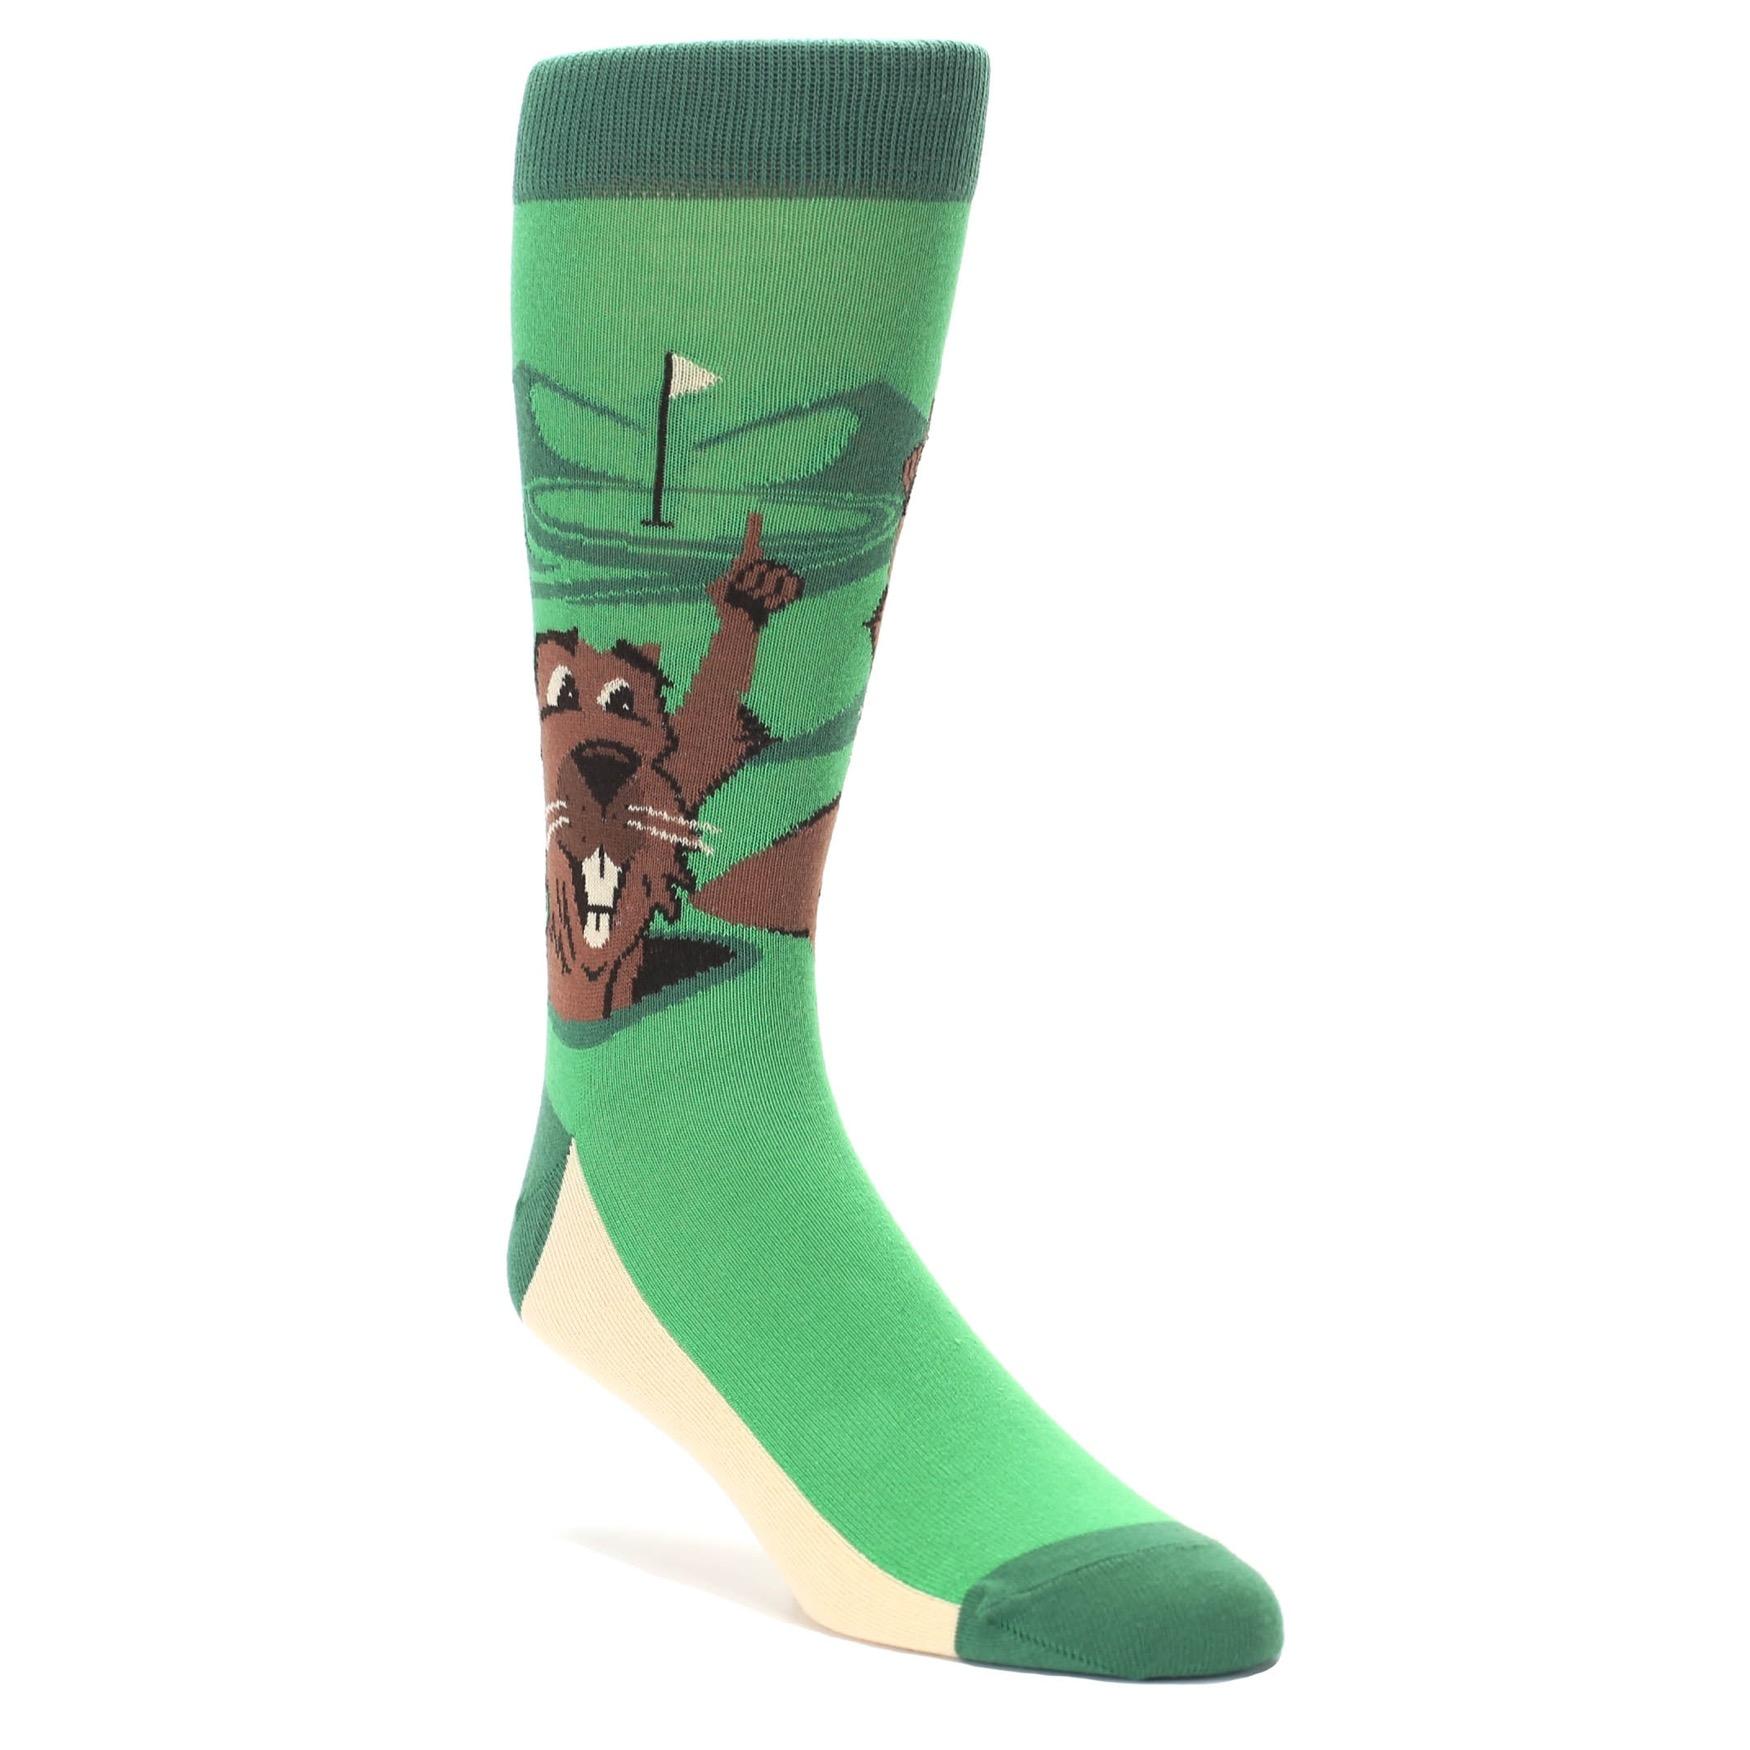 Go For It Gopher Golf Socks By Statement Sockwear Men